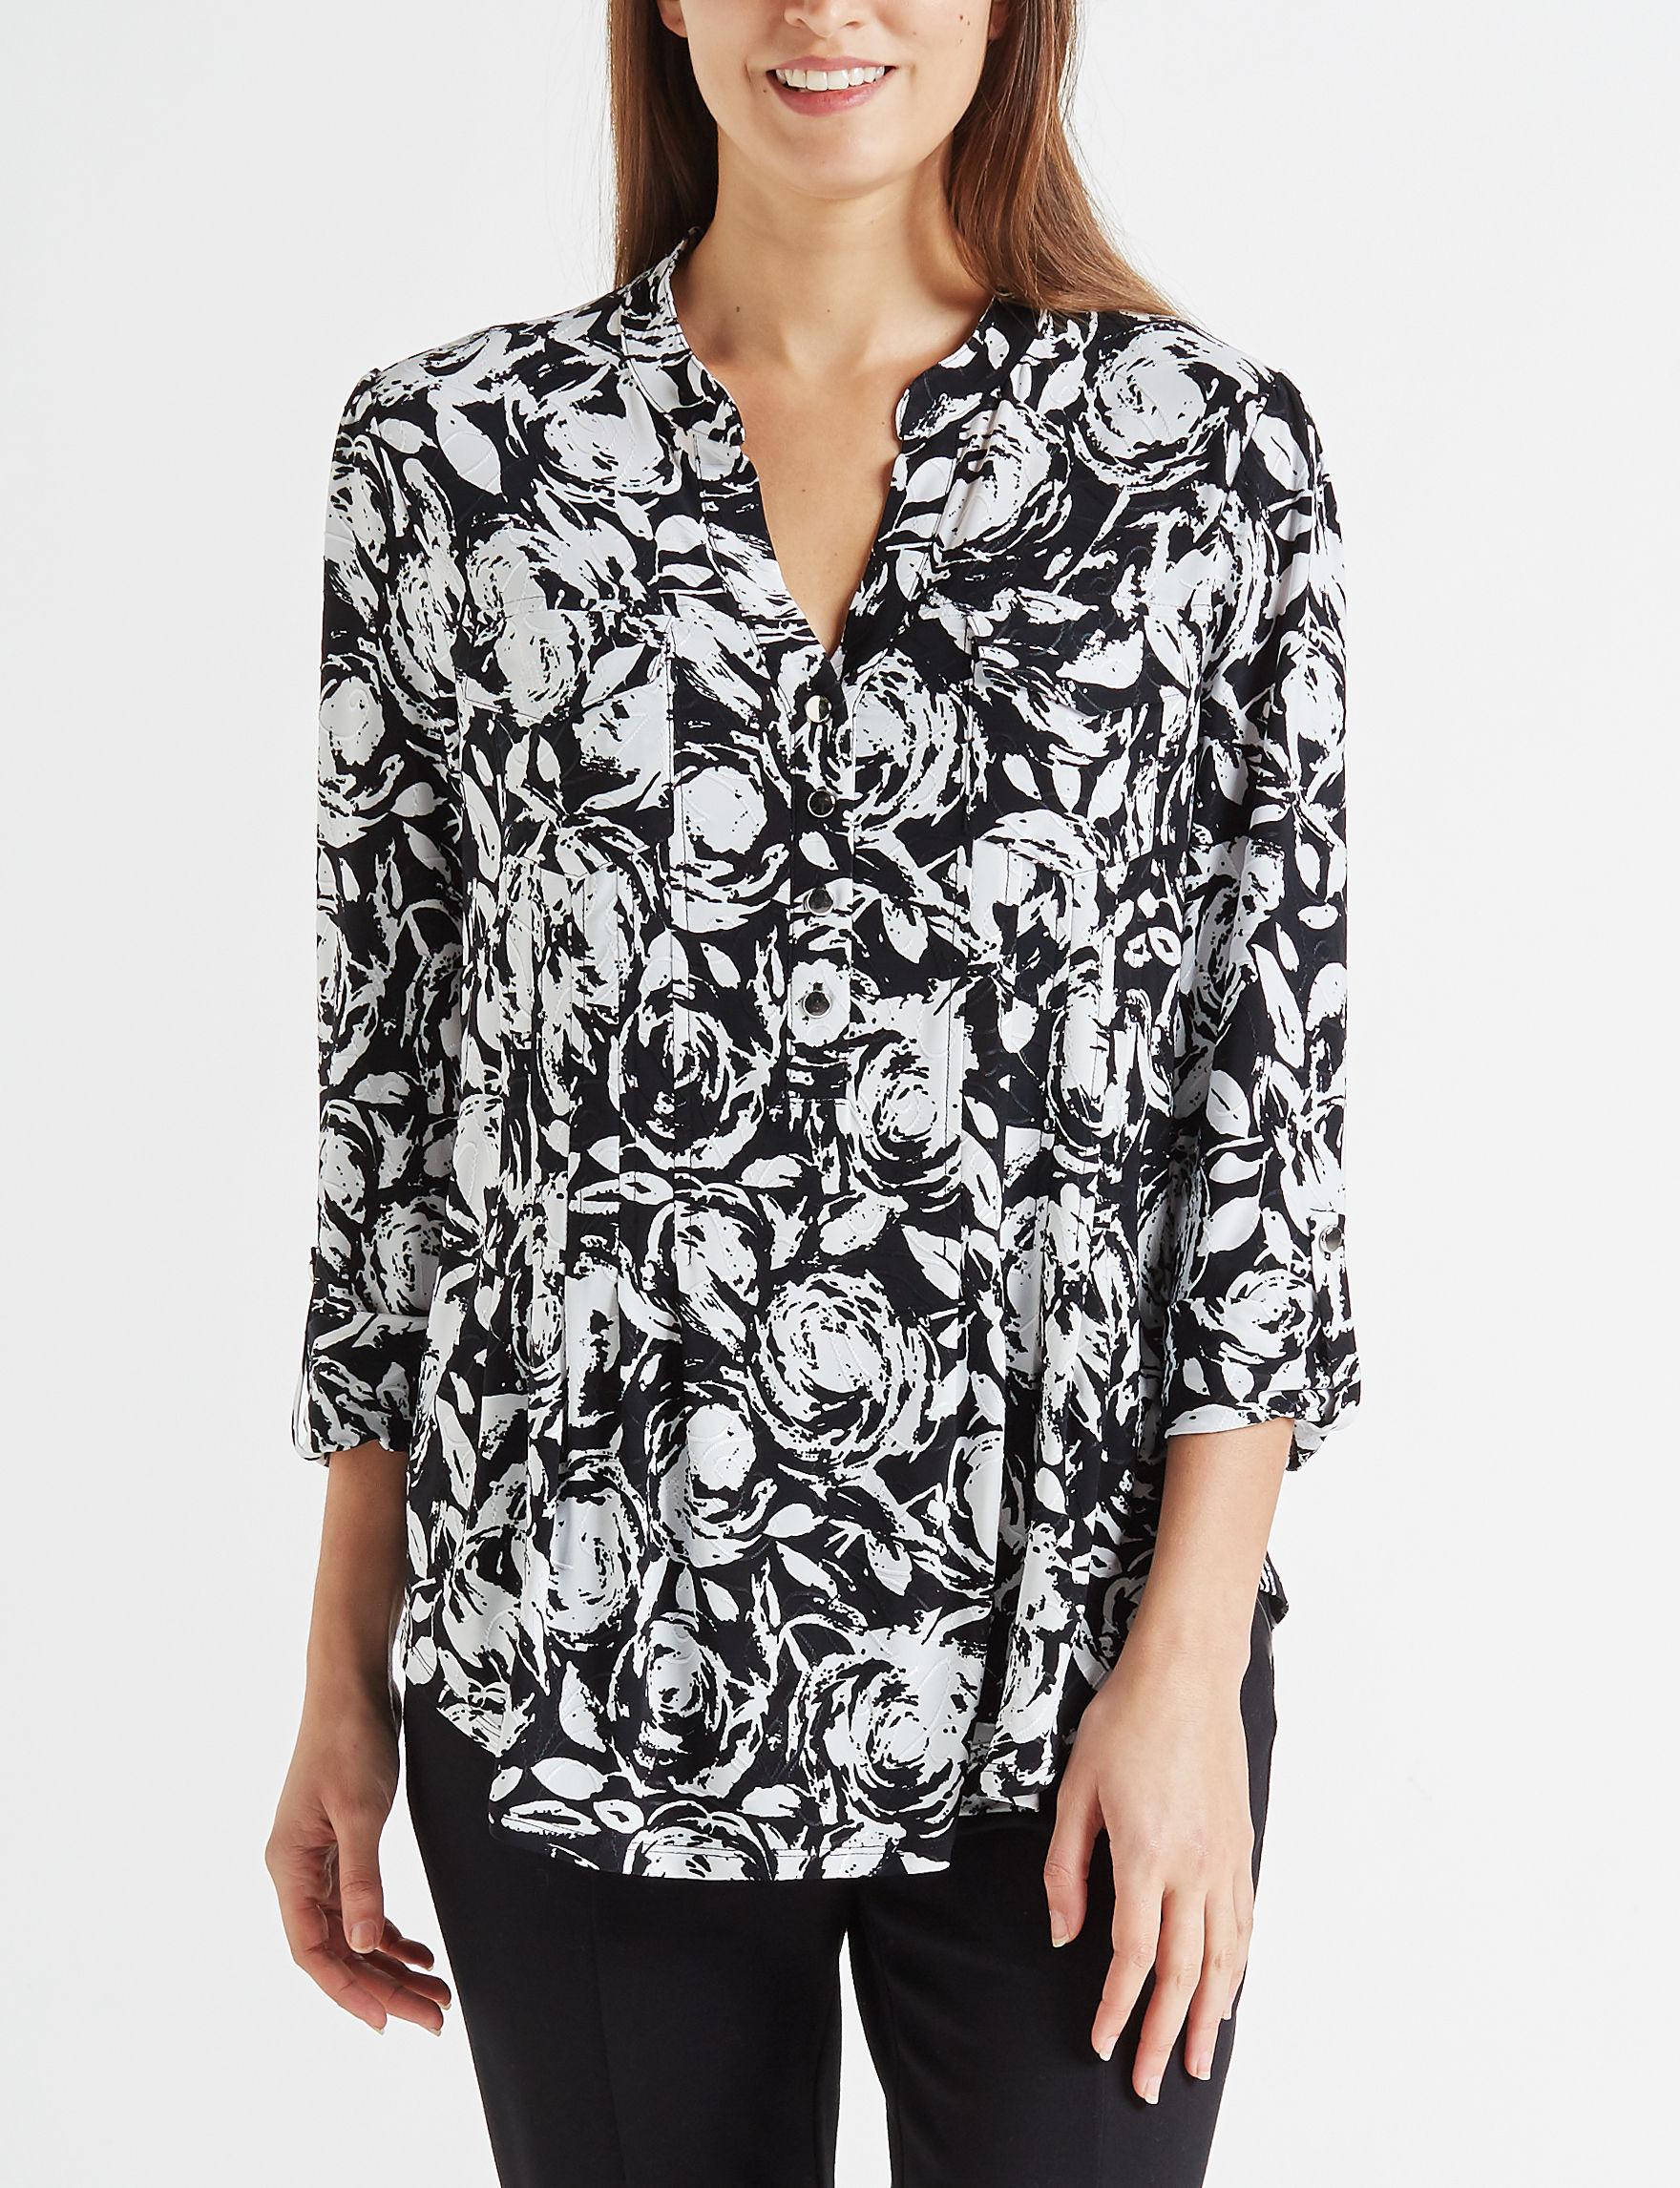 Verarose Black /  White Shirts & Blouses